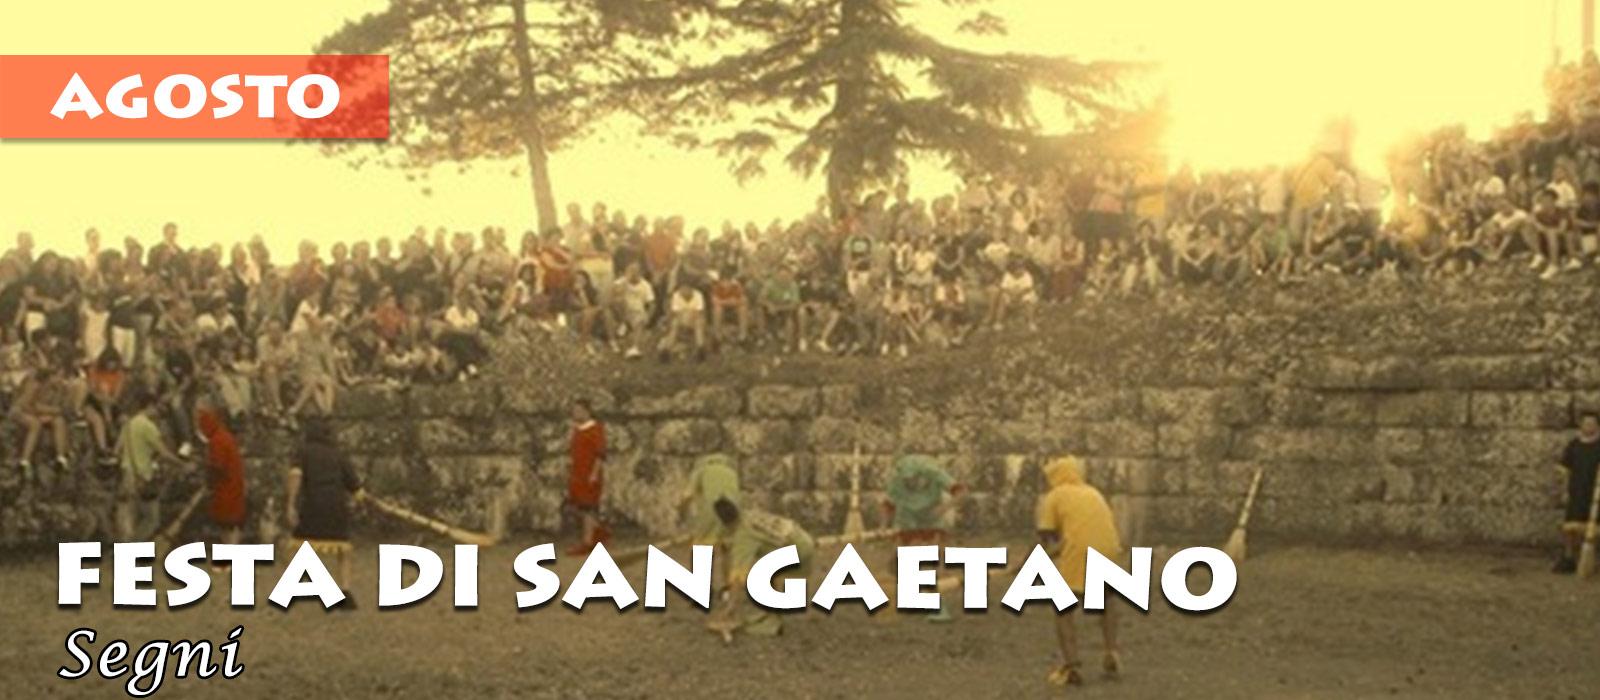 festa-di-san-gaetano